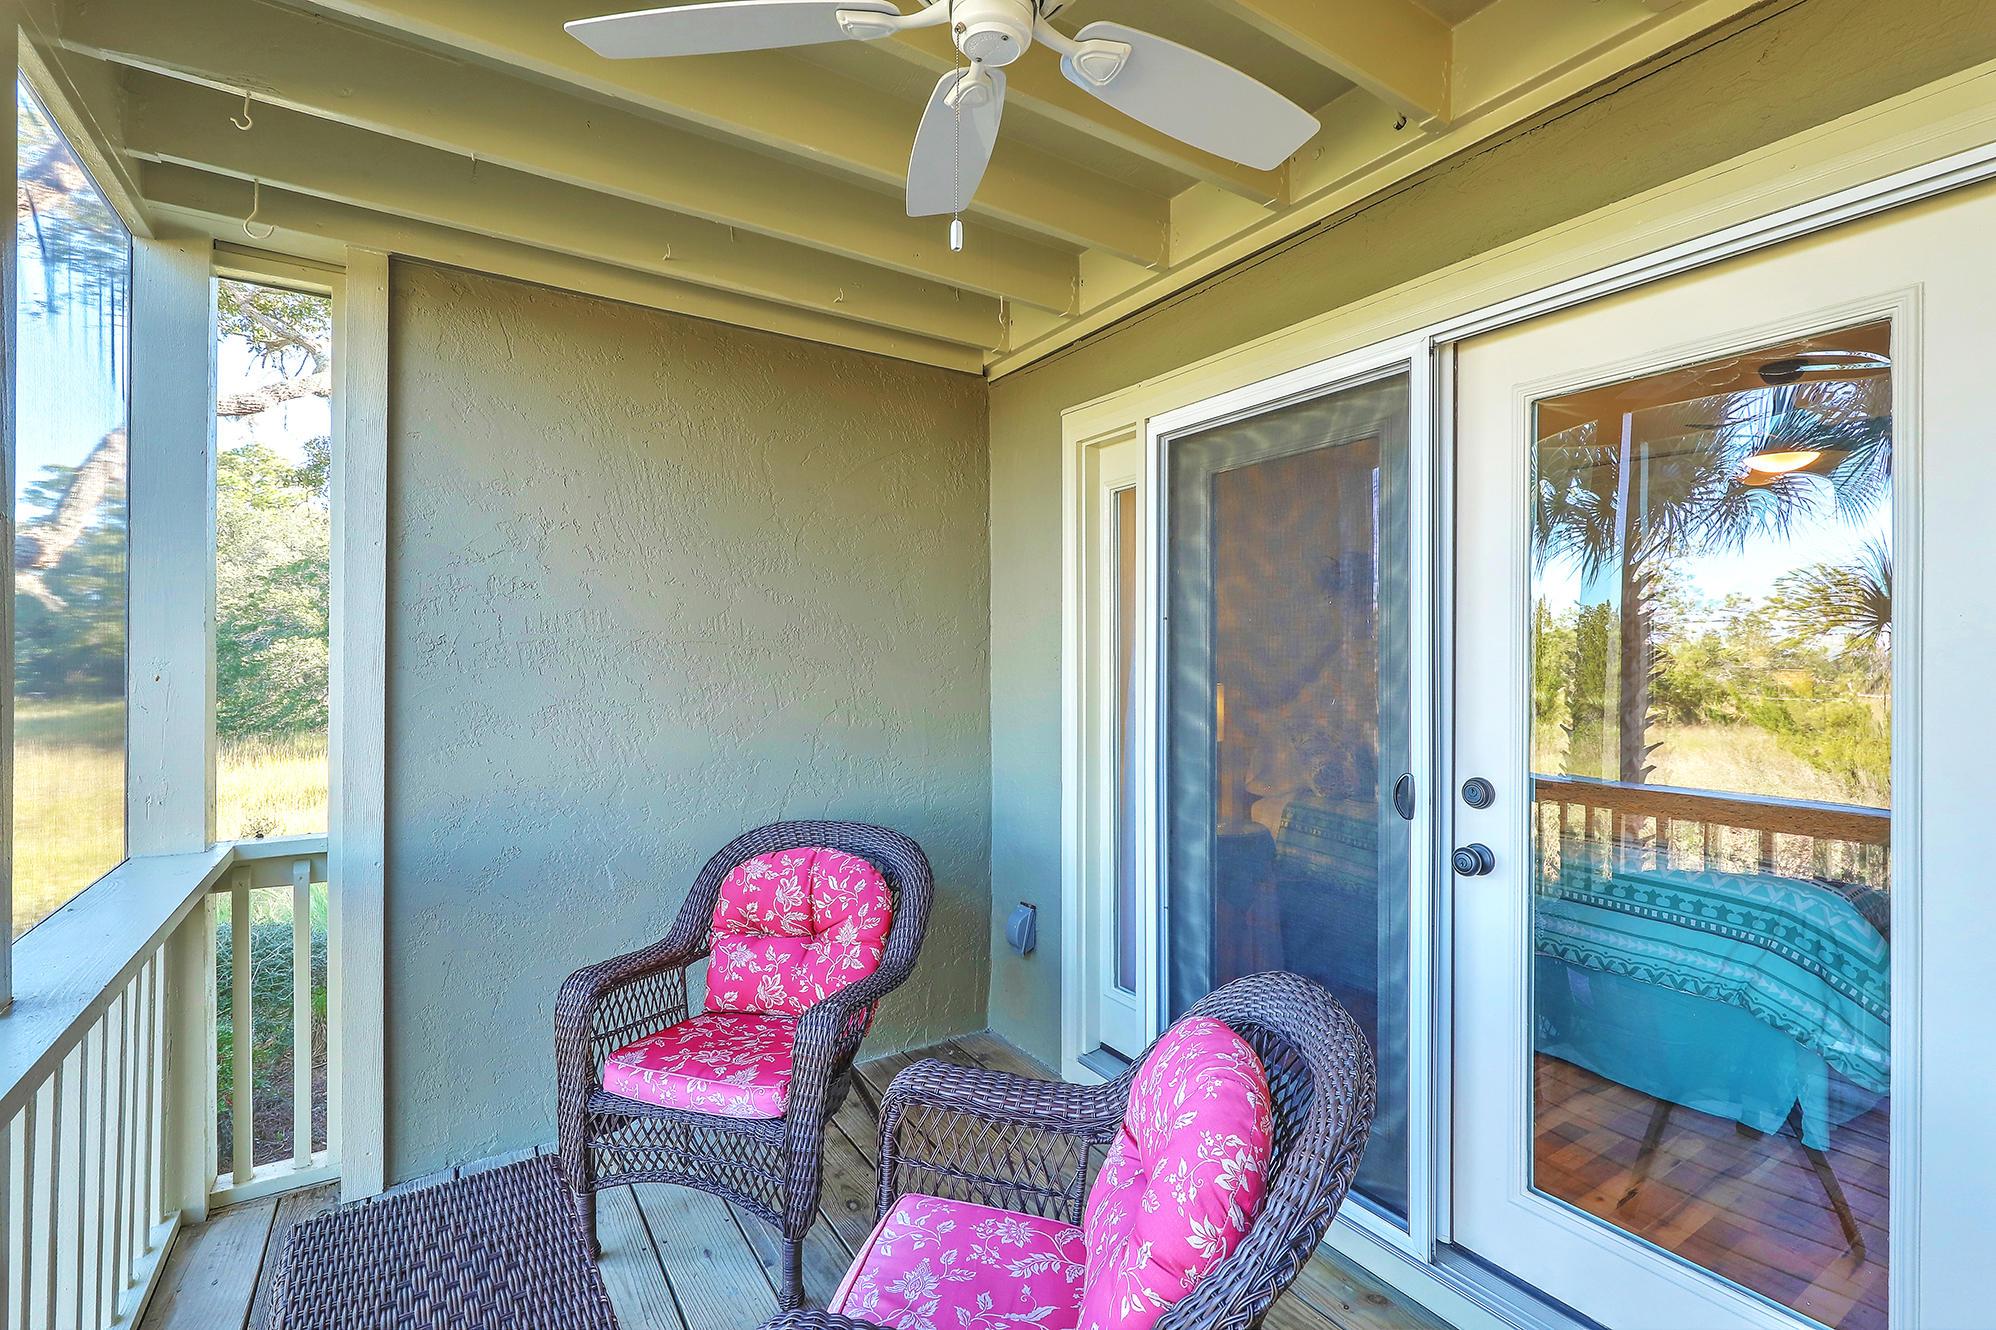 Seabrook Island Homes For Sale - 2103 Landfall, Johns Island, SC - 7